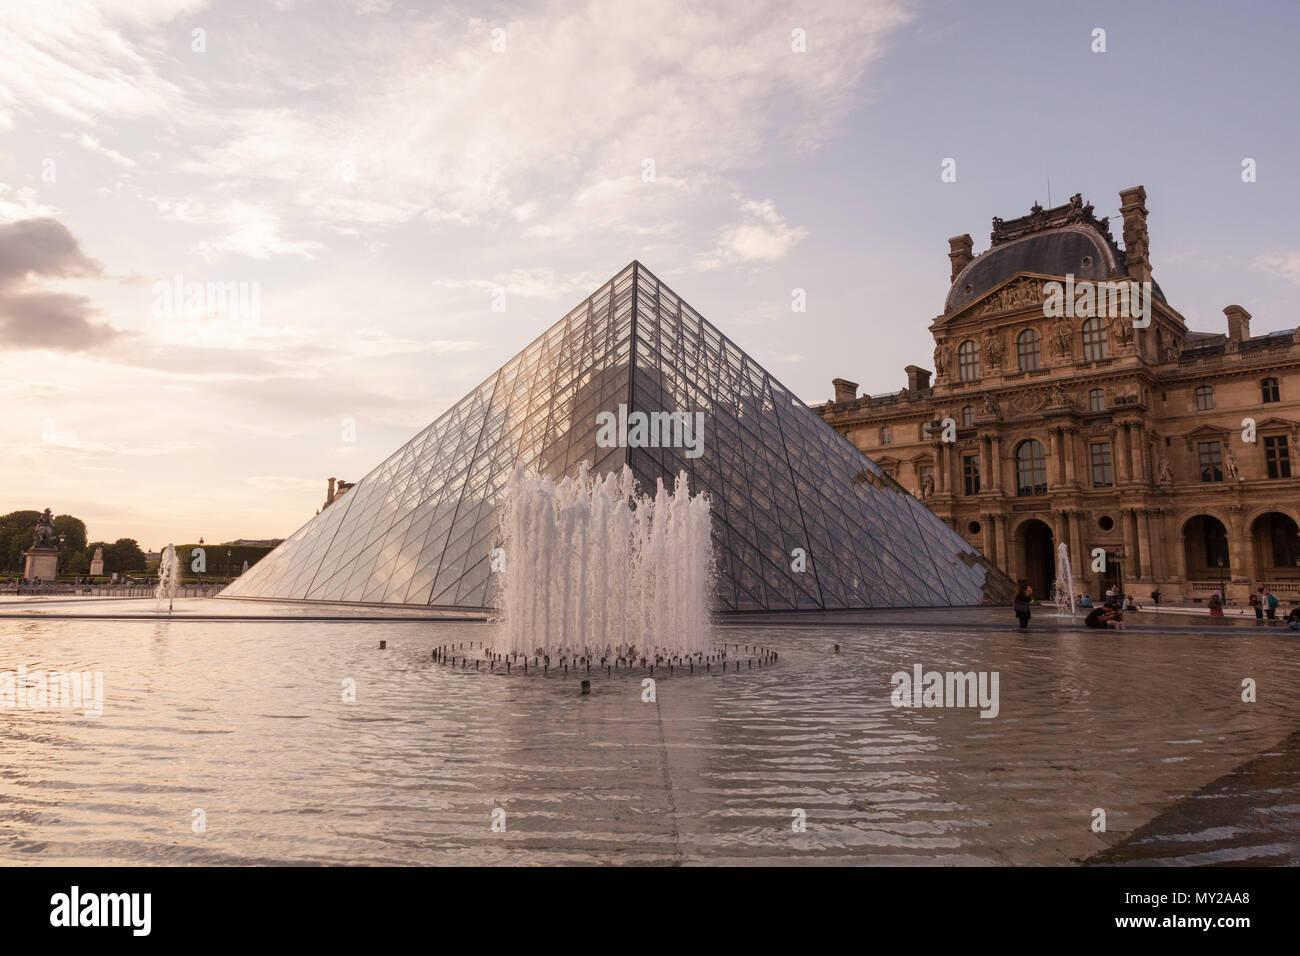 Museum du Louvre, Musée du Louvre and the glass pyramid, Paris, France, Europe. Stock Photo